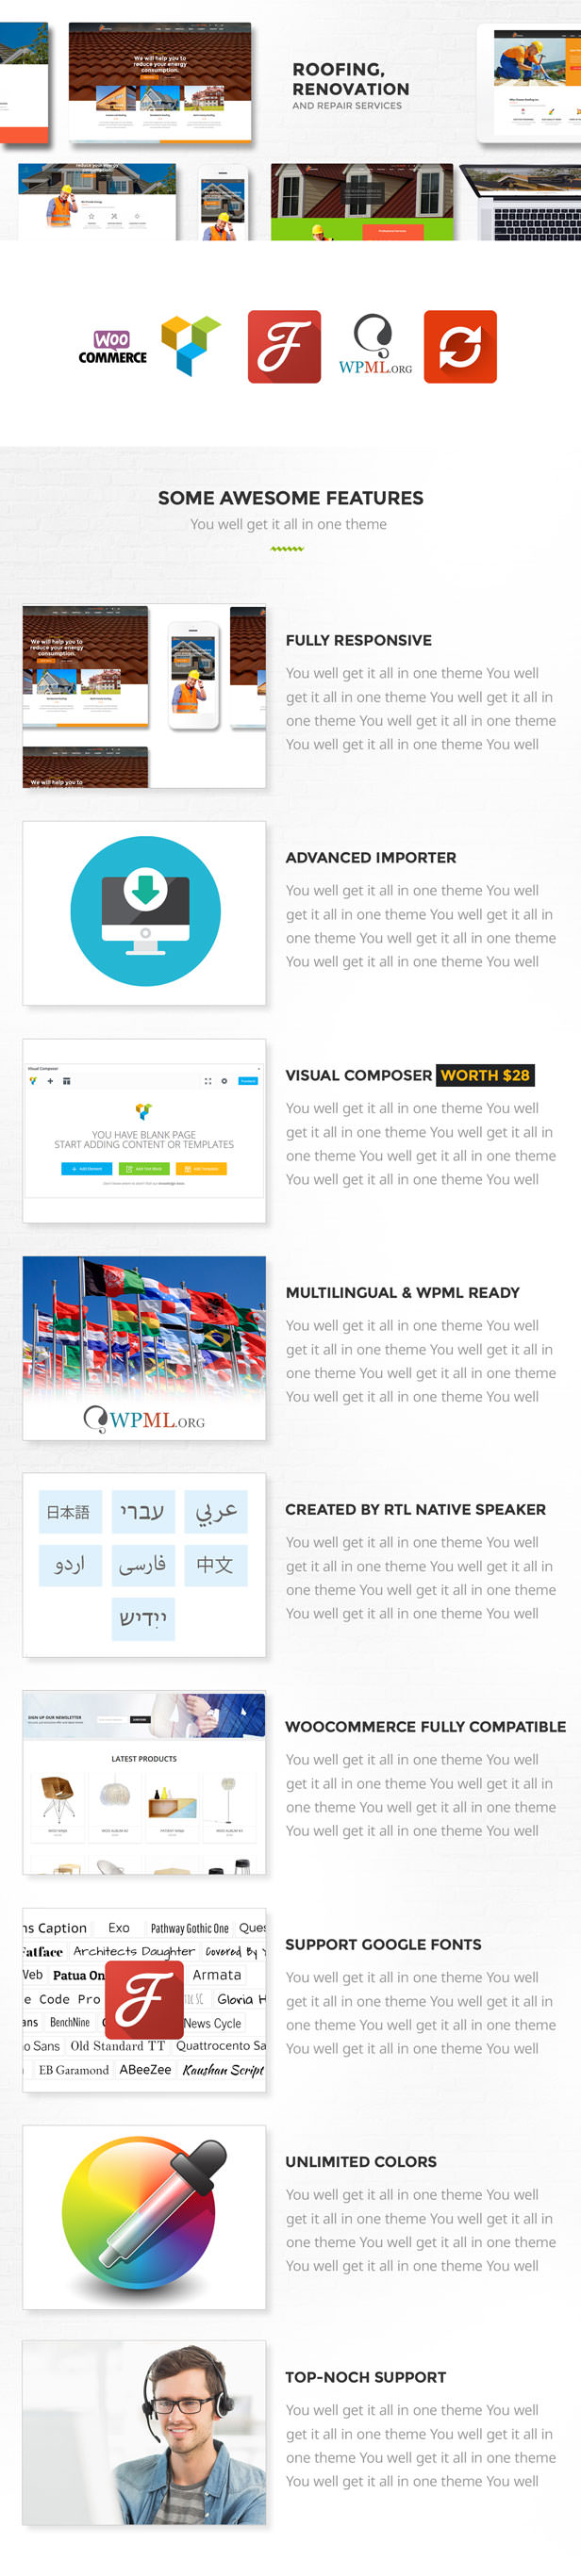 Roofing, Renovation & Repair Service WordPress theme